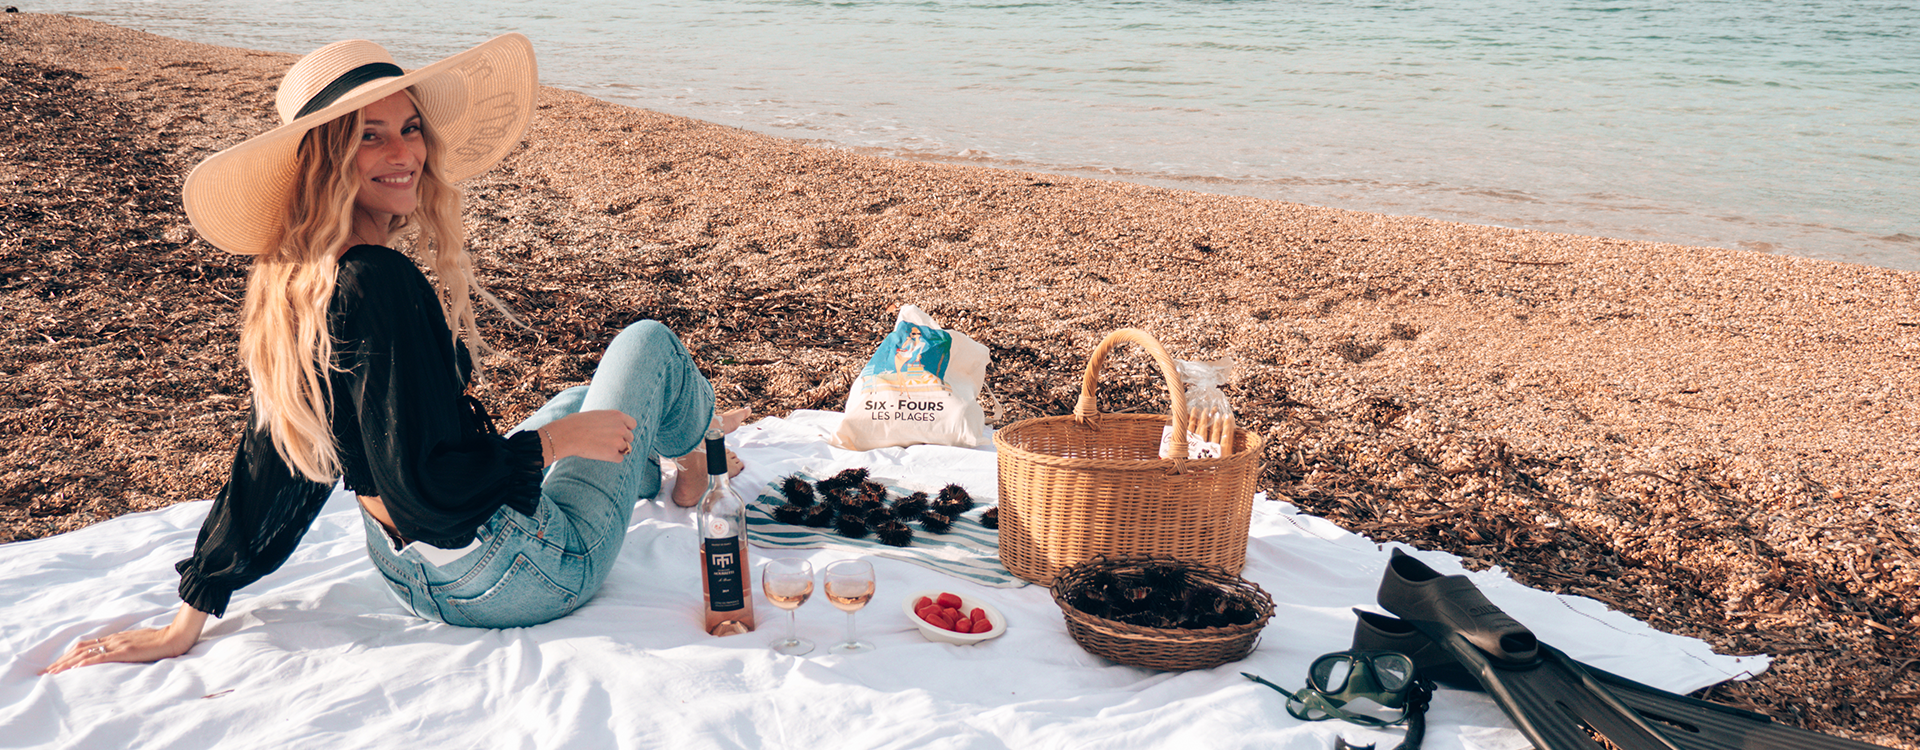 Sea urchin tasting on the beach